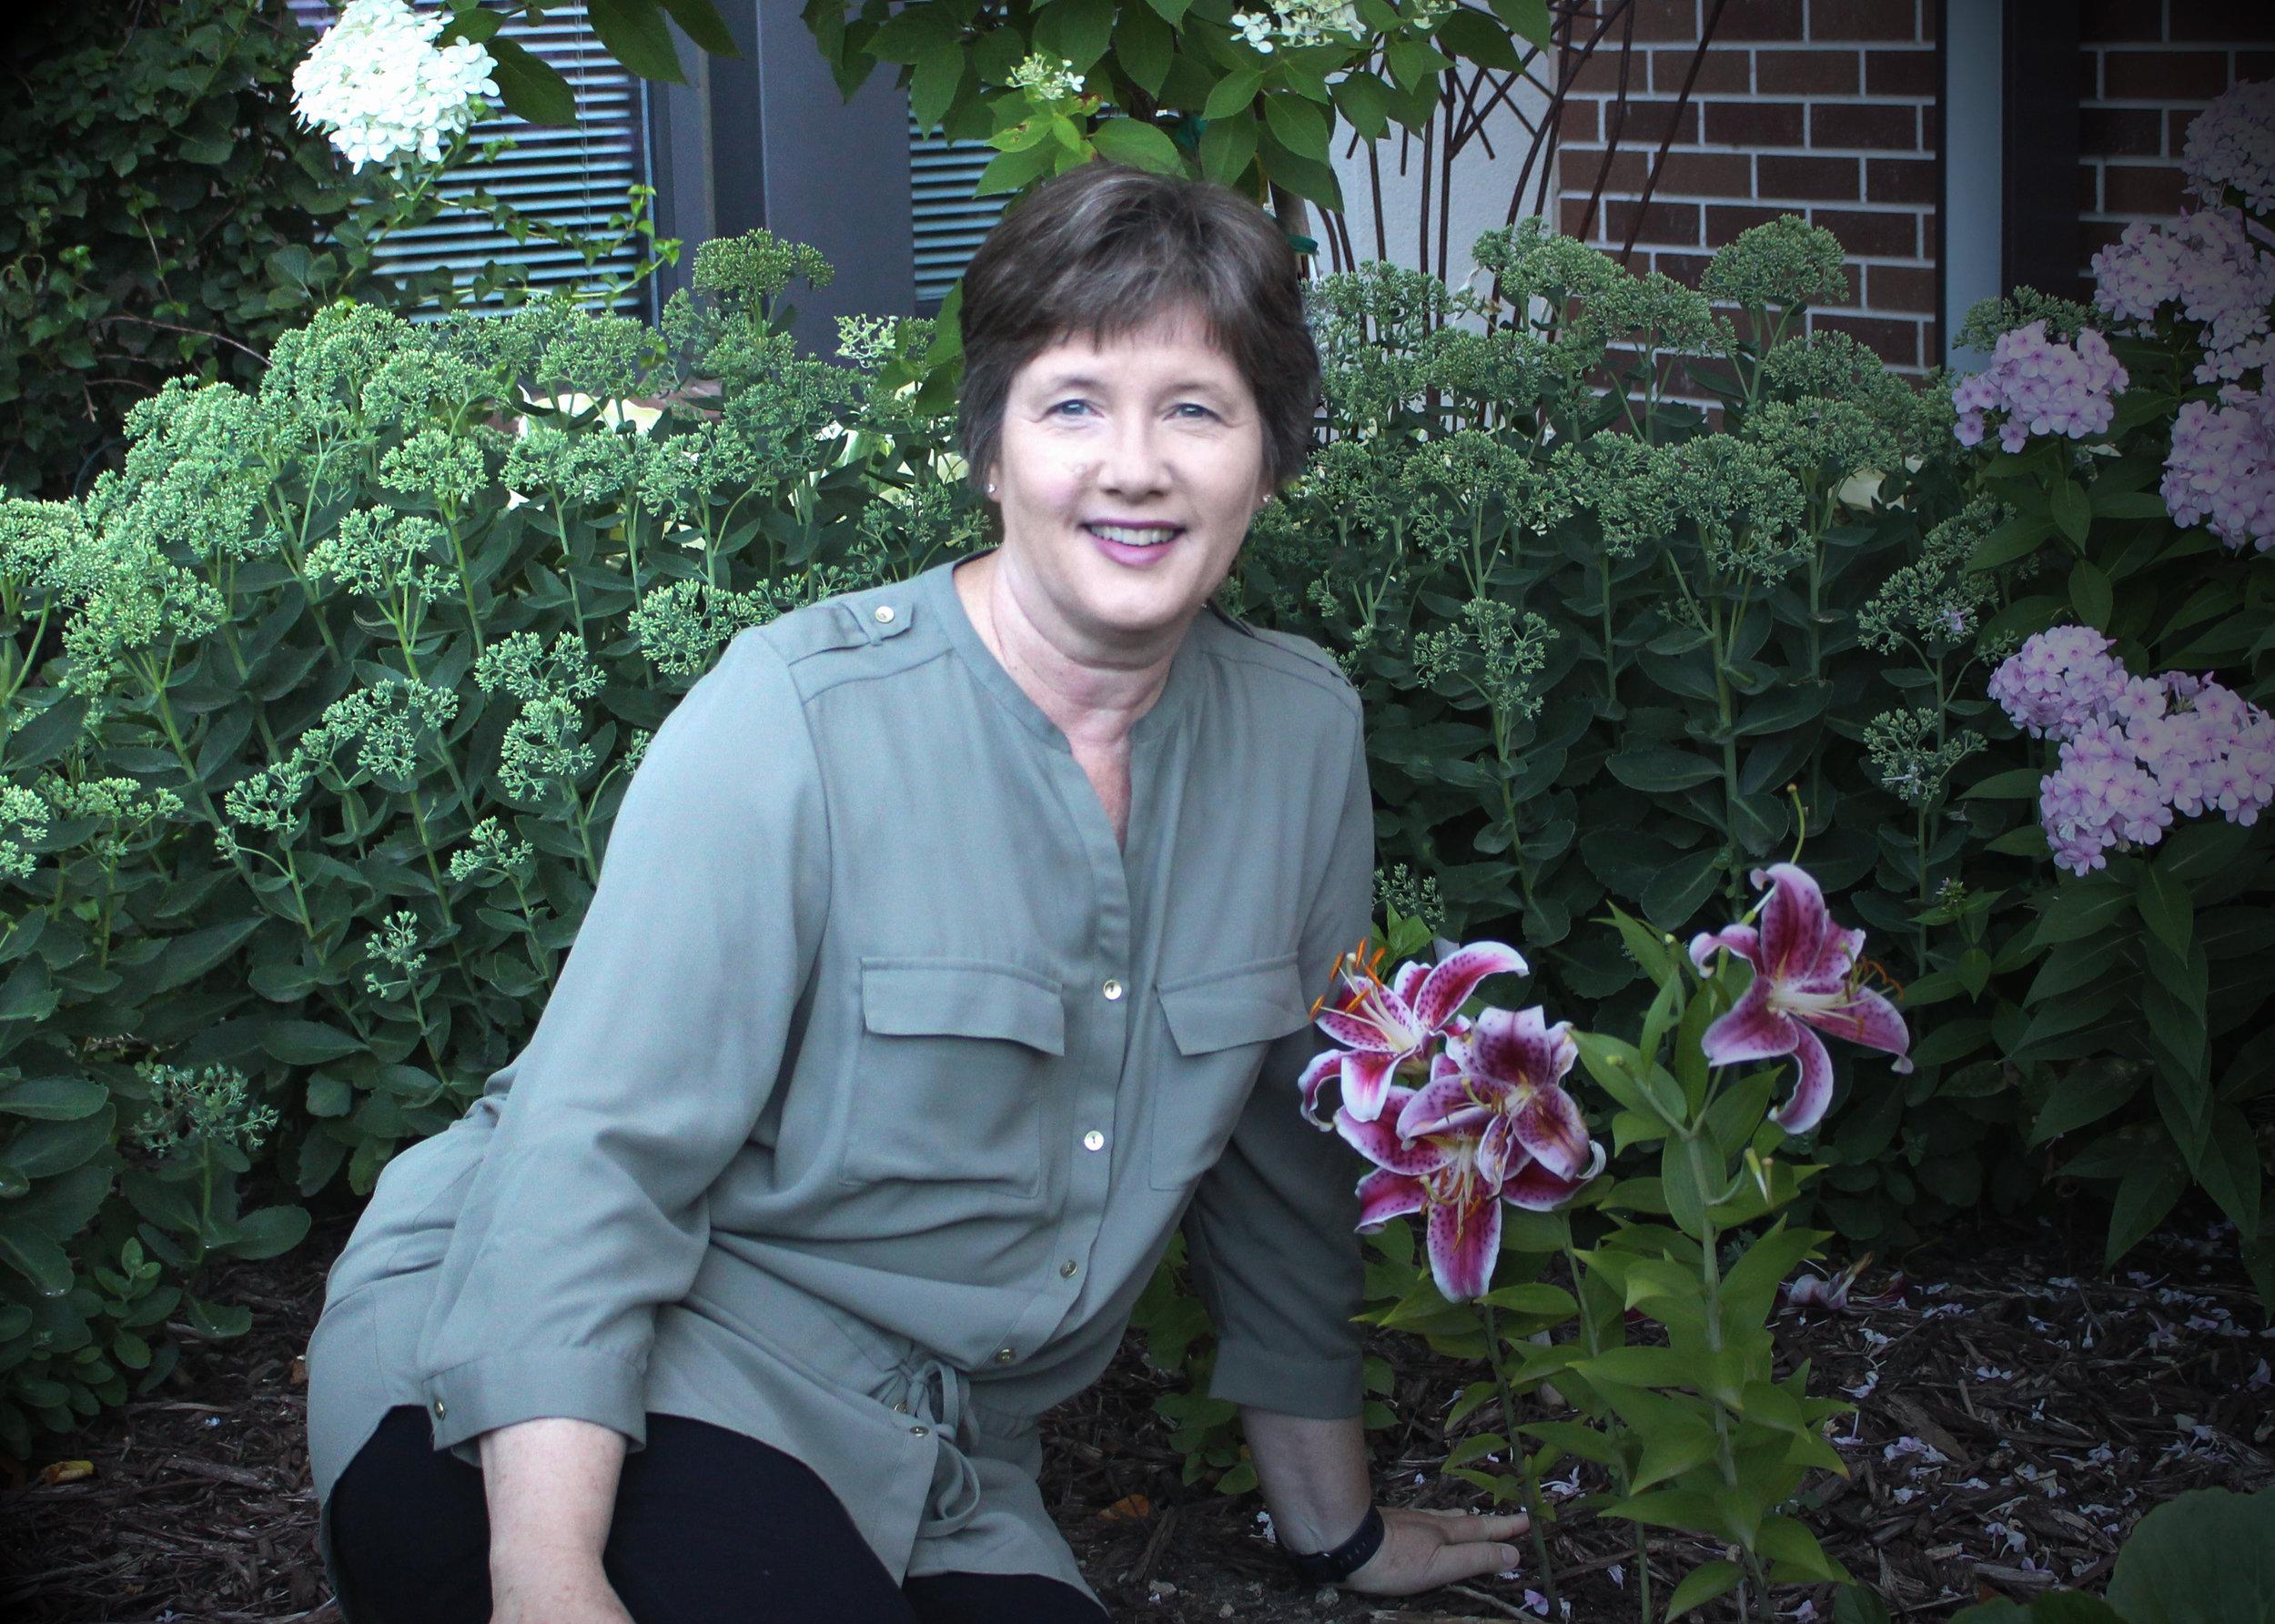 Carol Fisher - Parish Administratorcarolf@gloria-dei.com